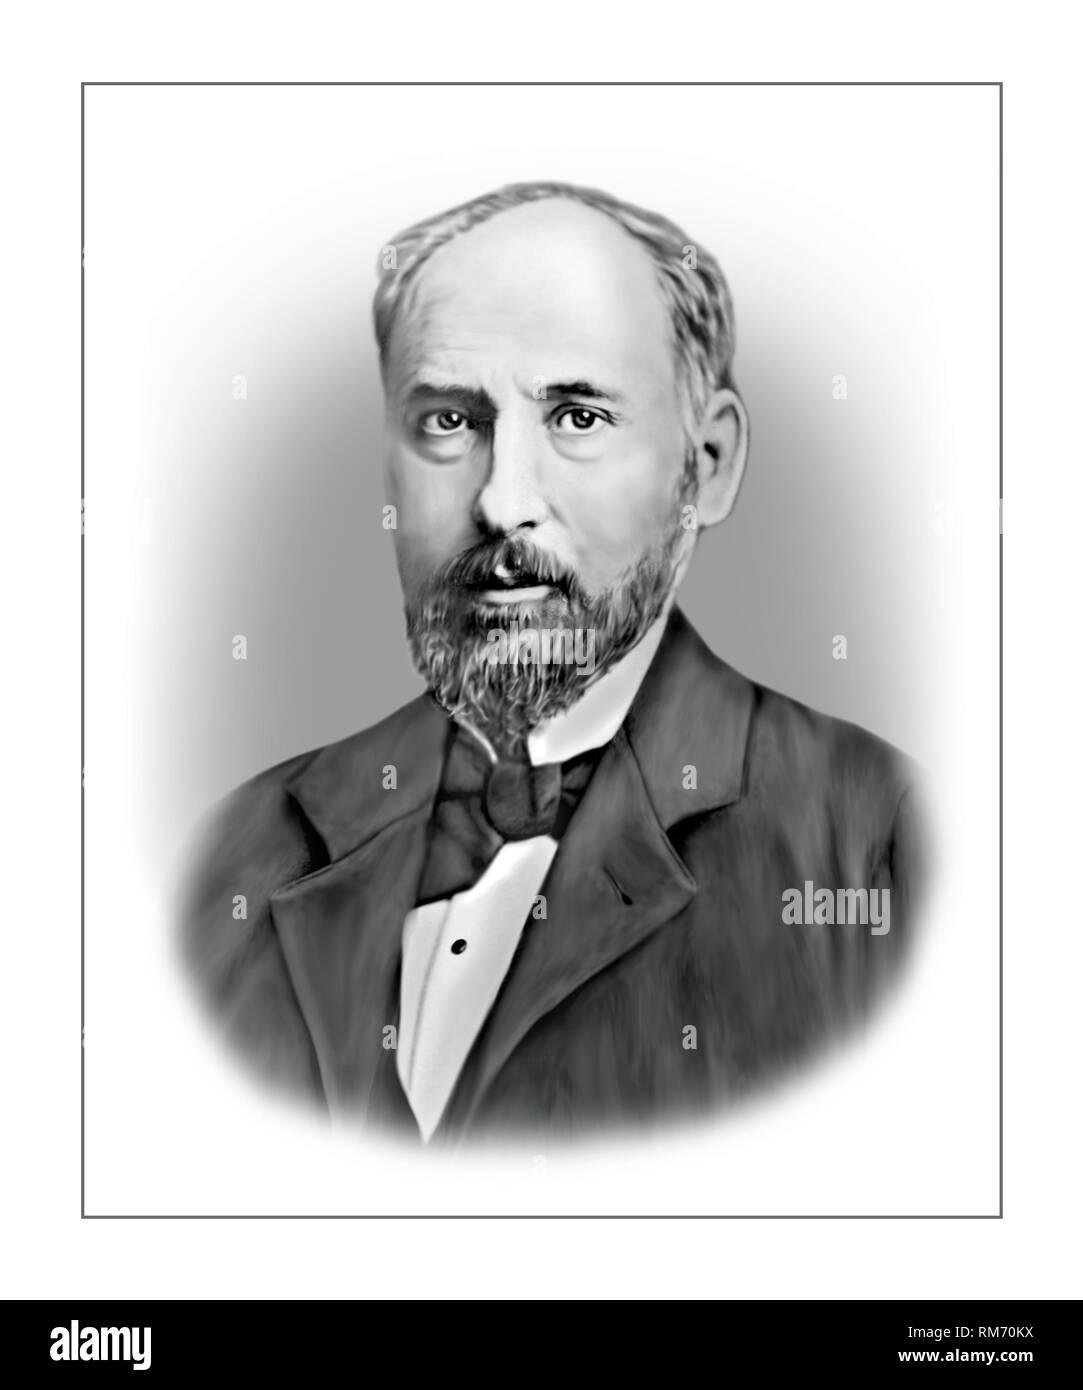 Santiago Ramon y Cajal 1852-1934 Spanish Neuroscientist Pathologist - Stock Image